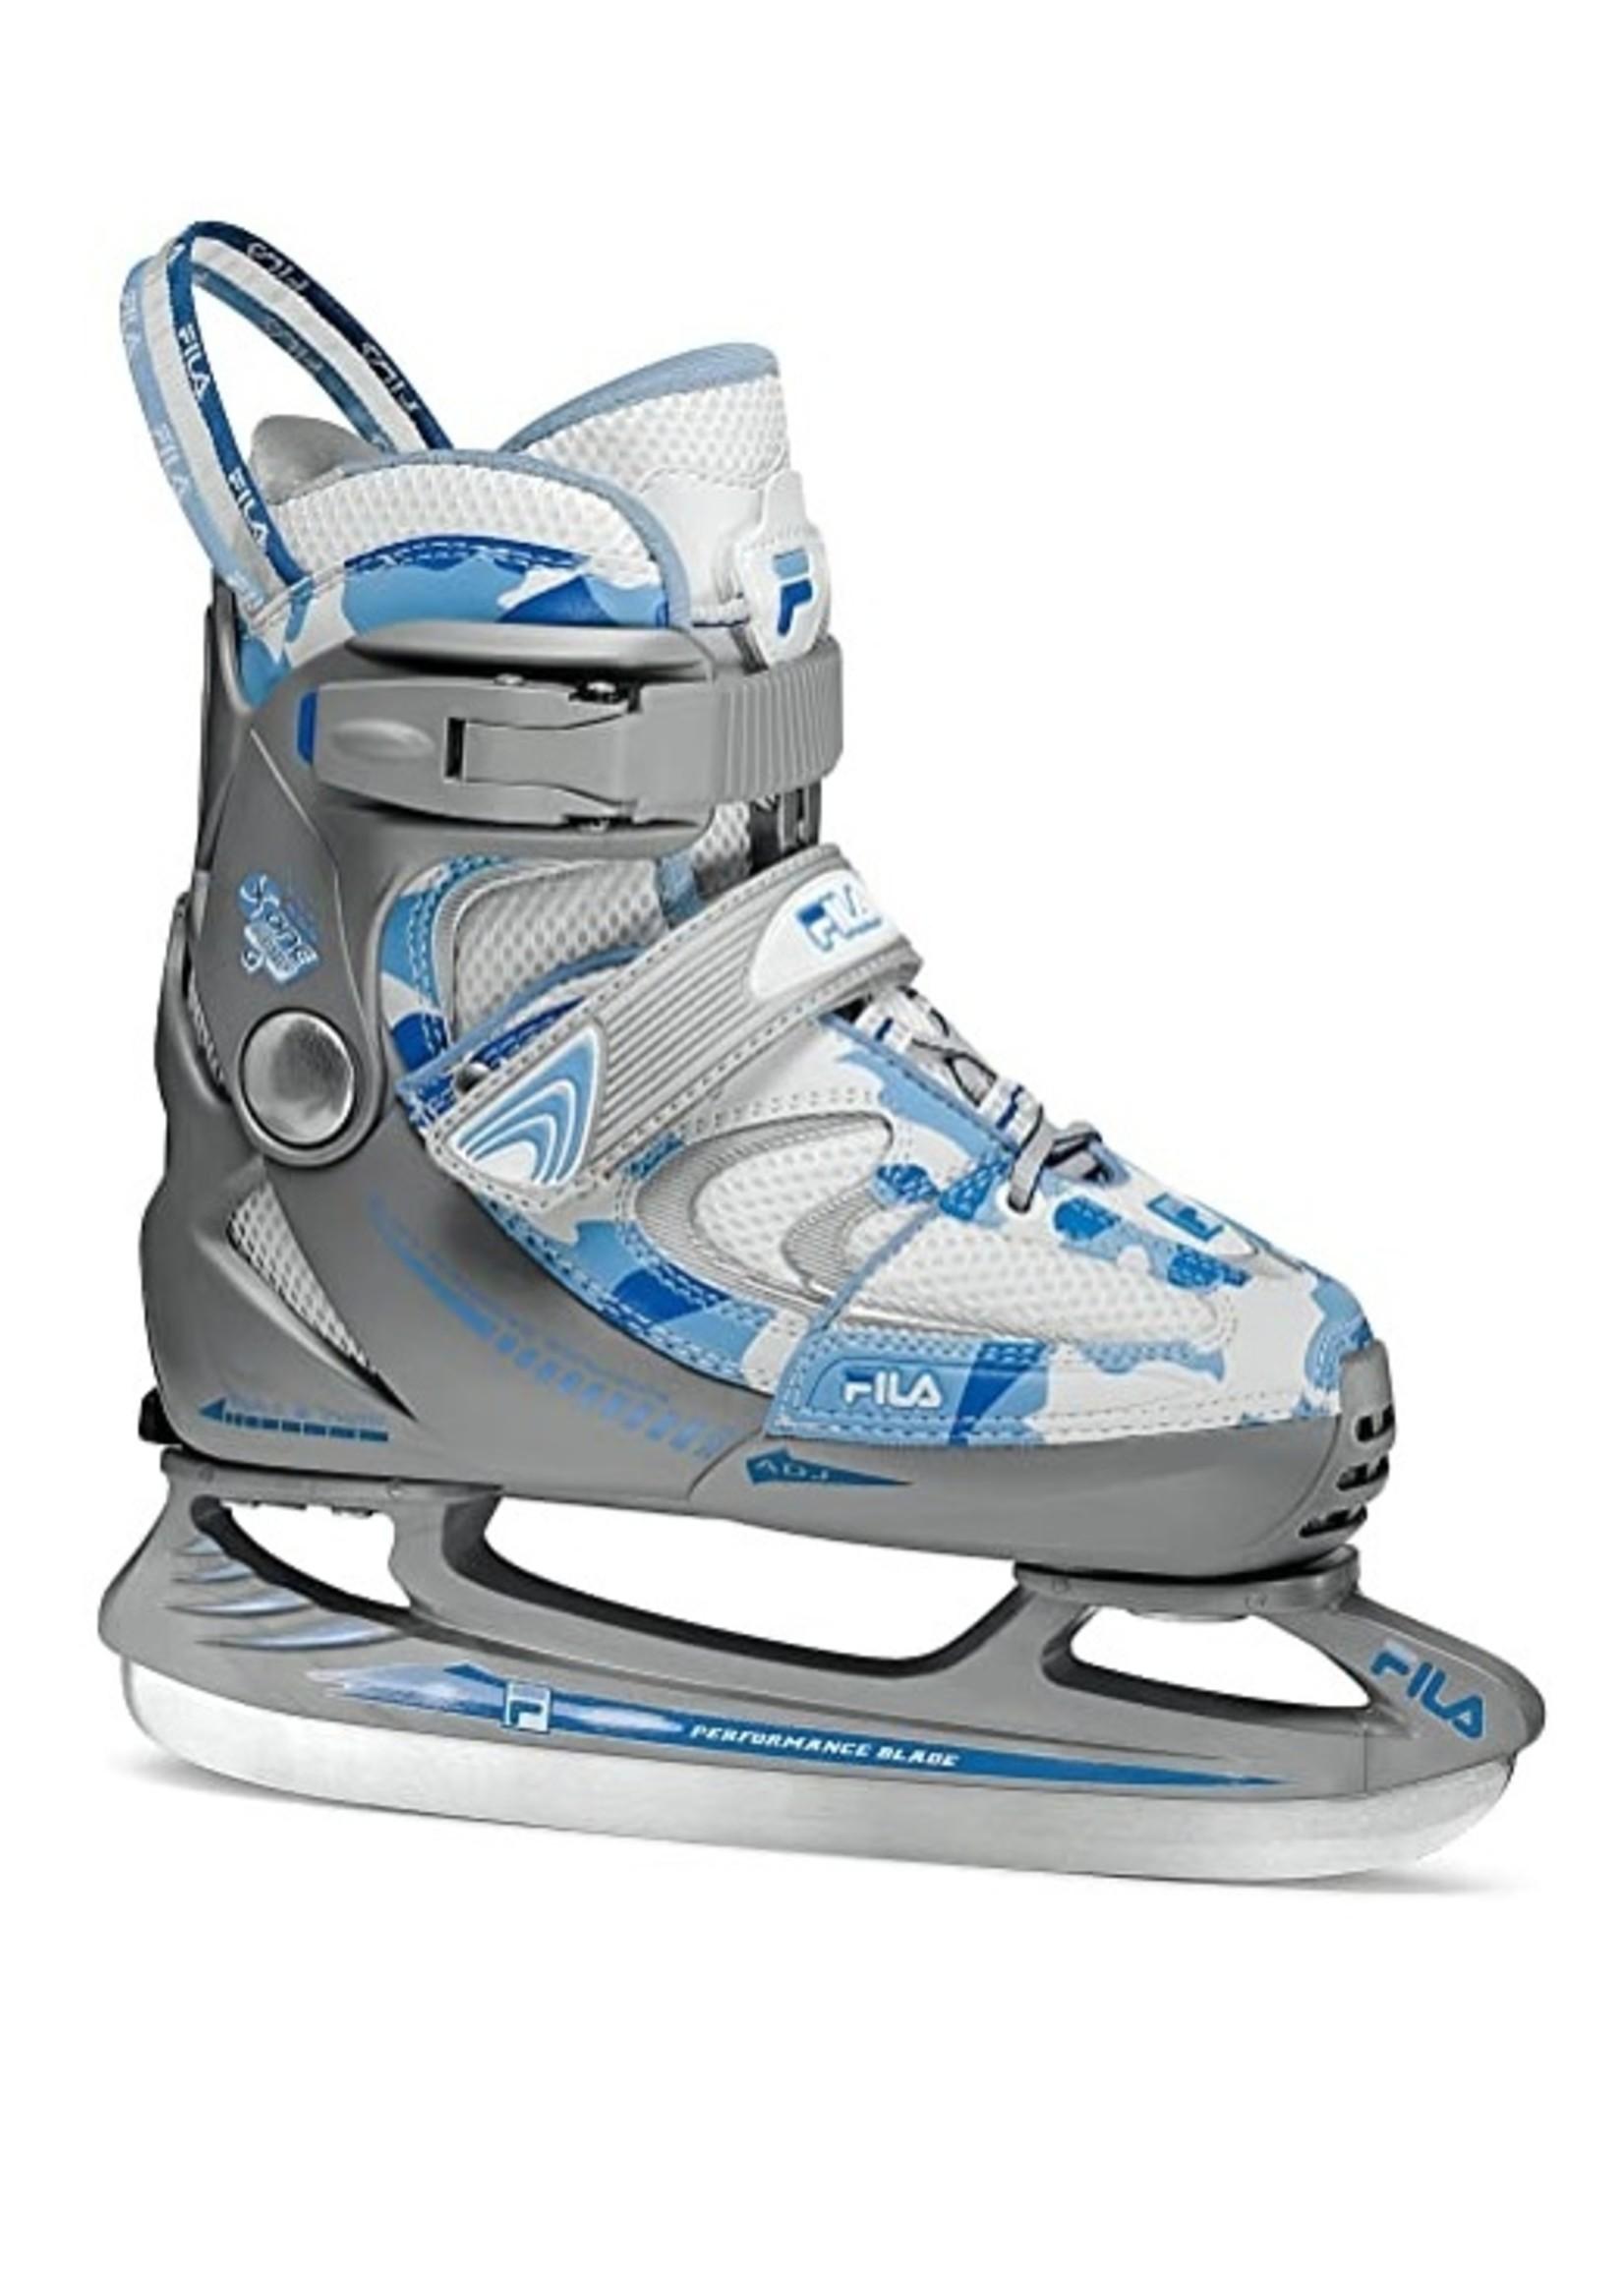 Fila Fila  X-One Comp G Ice Army Blue IJshockey schaats, grijs met wit en blauw